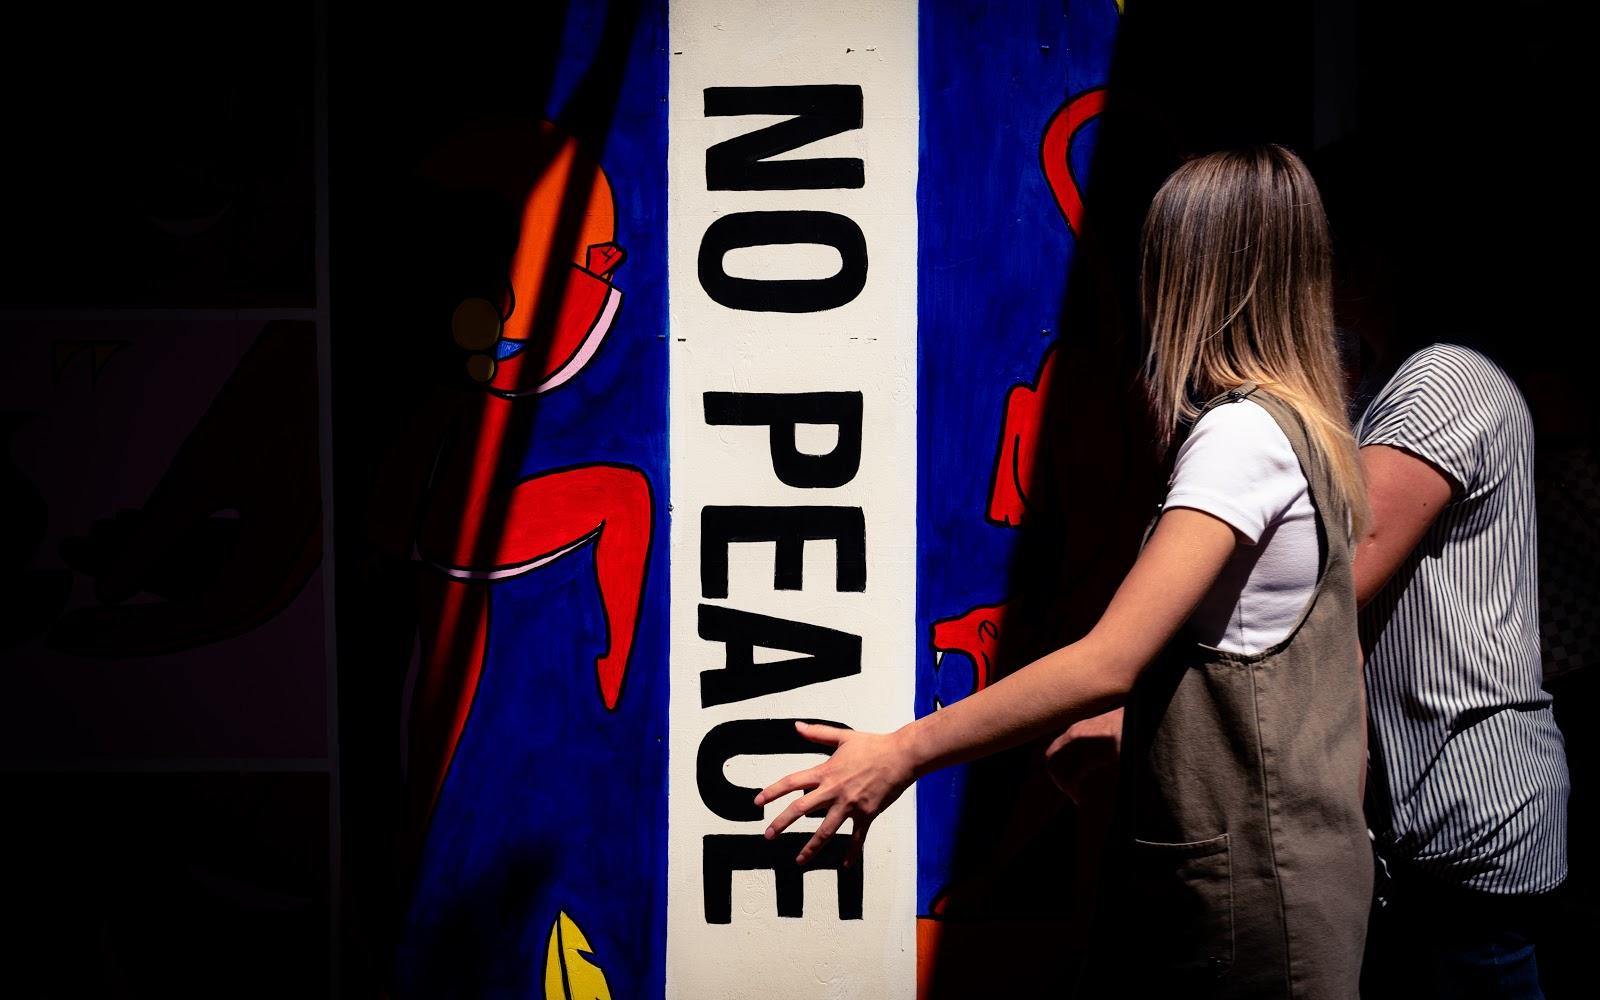 No Peace sign